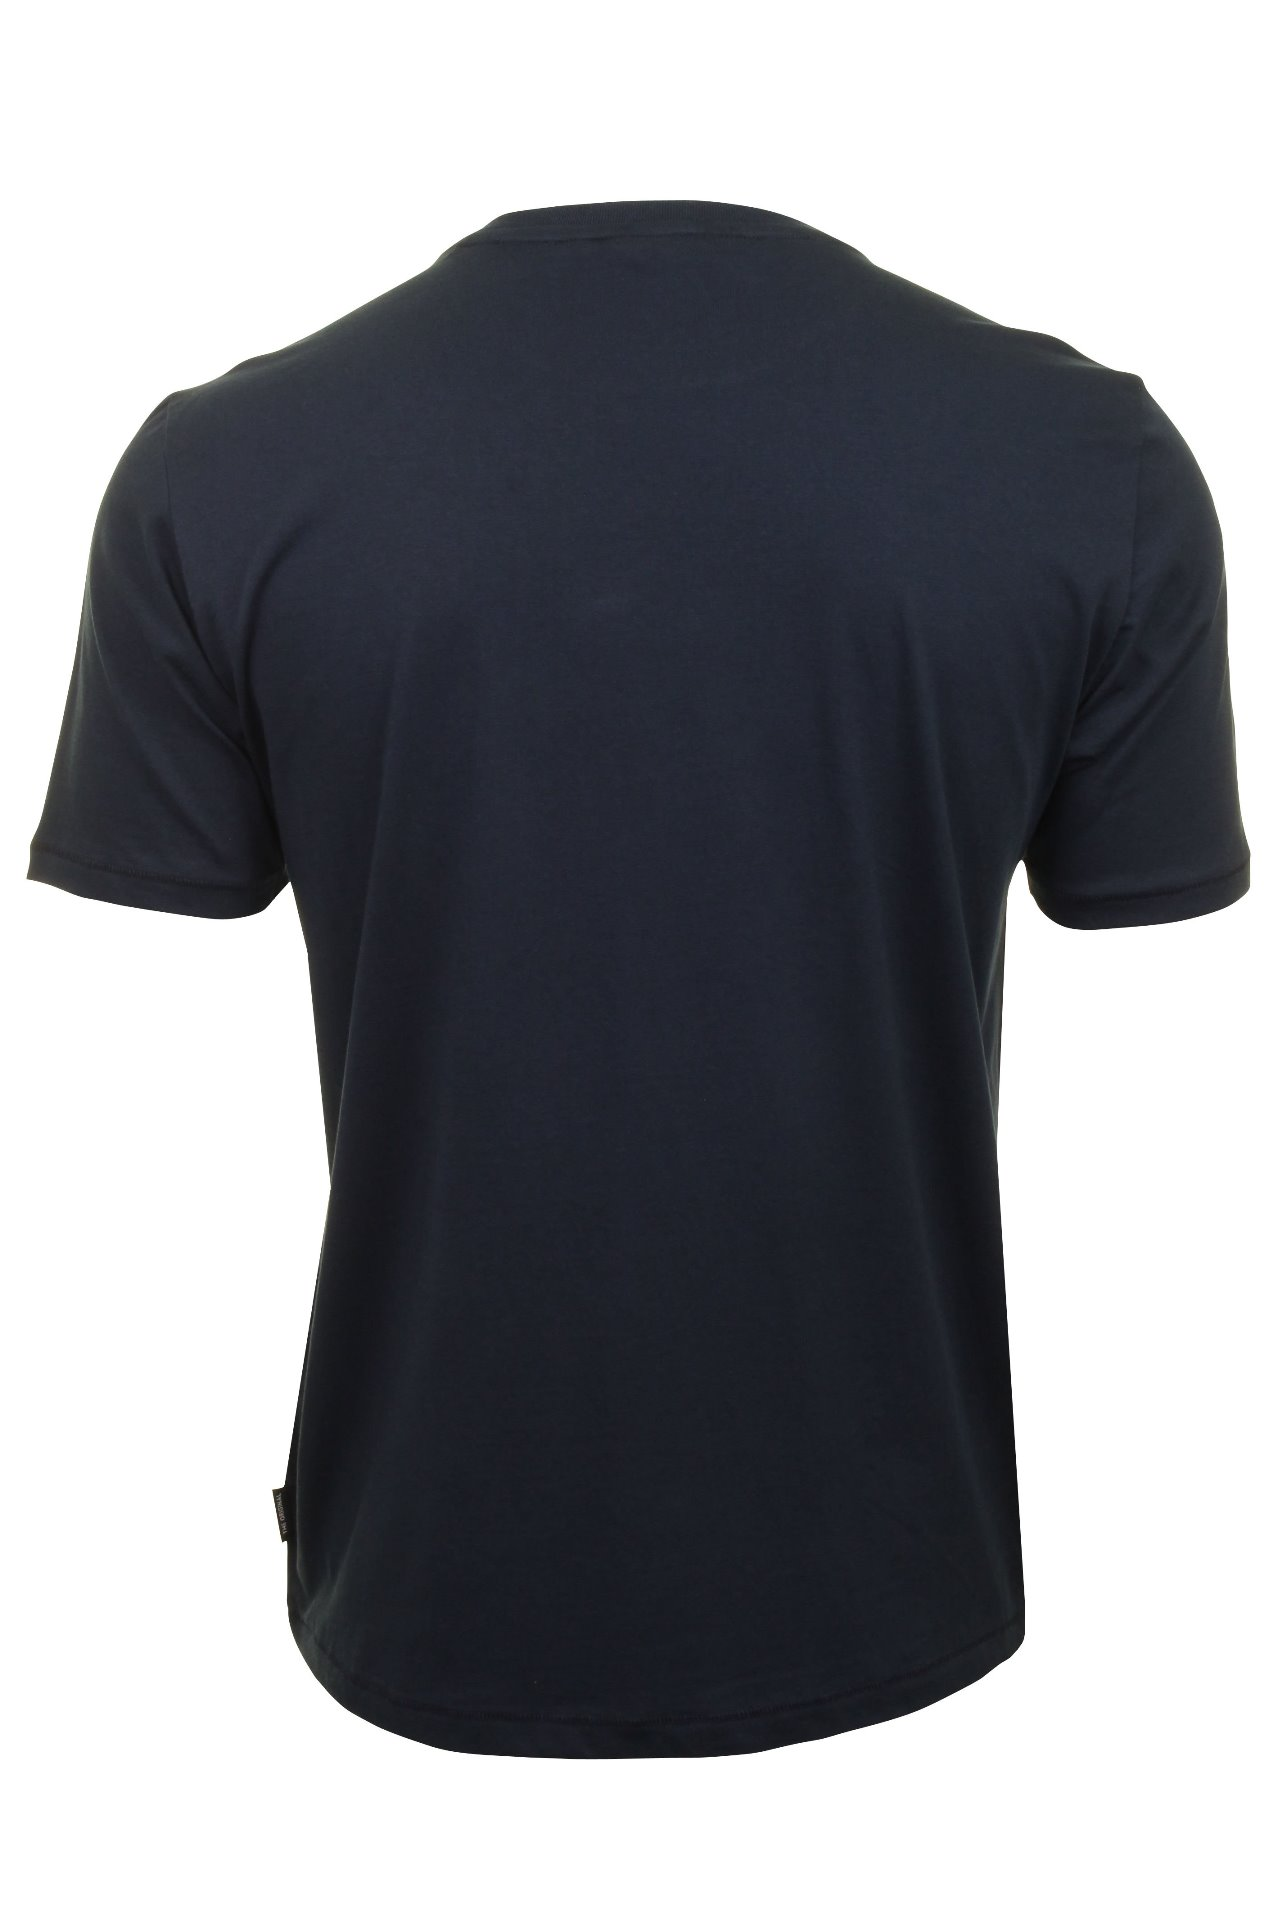 Ben-Sherman-039-Headlamp-Badges-039-Mens-T-Shirt thumbnail 3